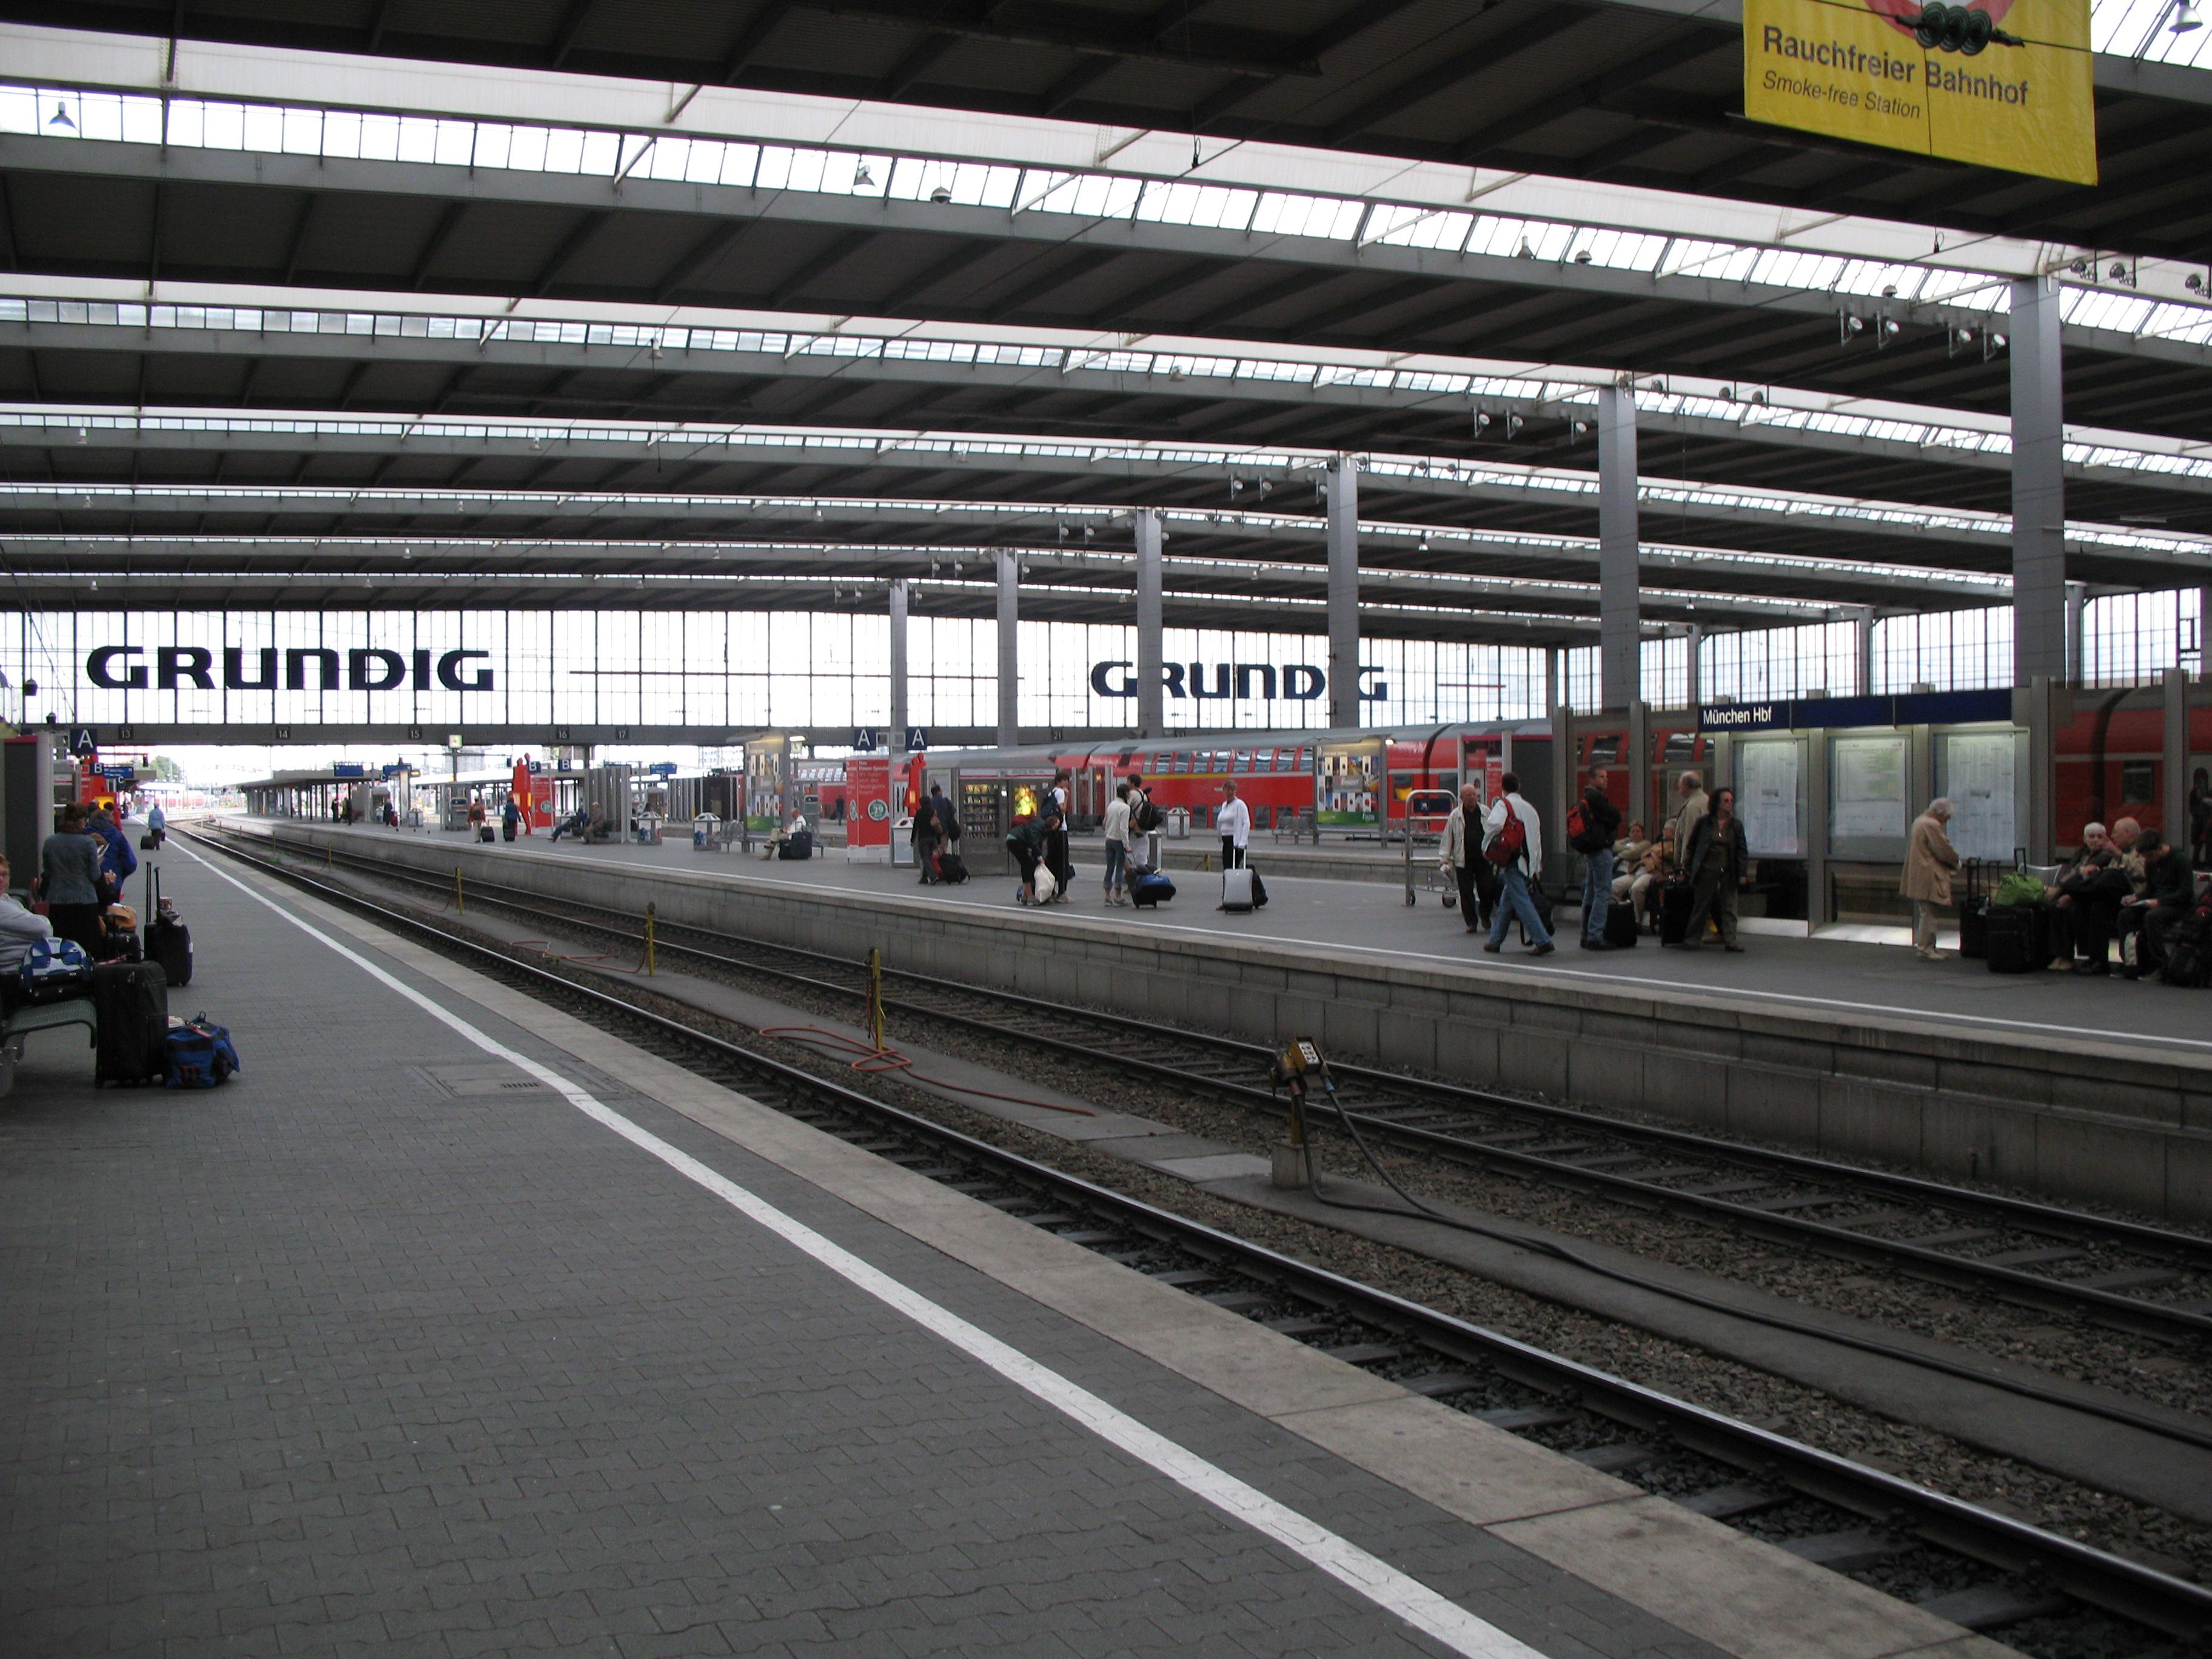 File:2563 - München - Hauptbahnhof.JPG